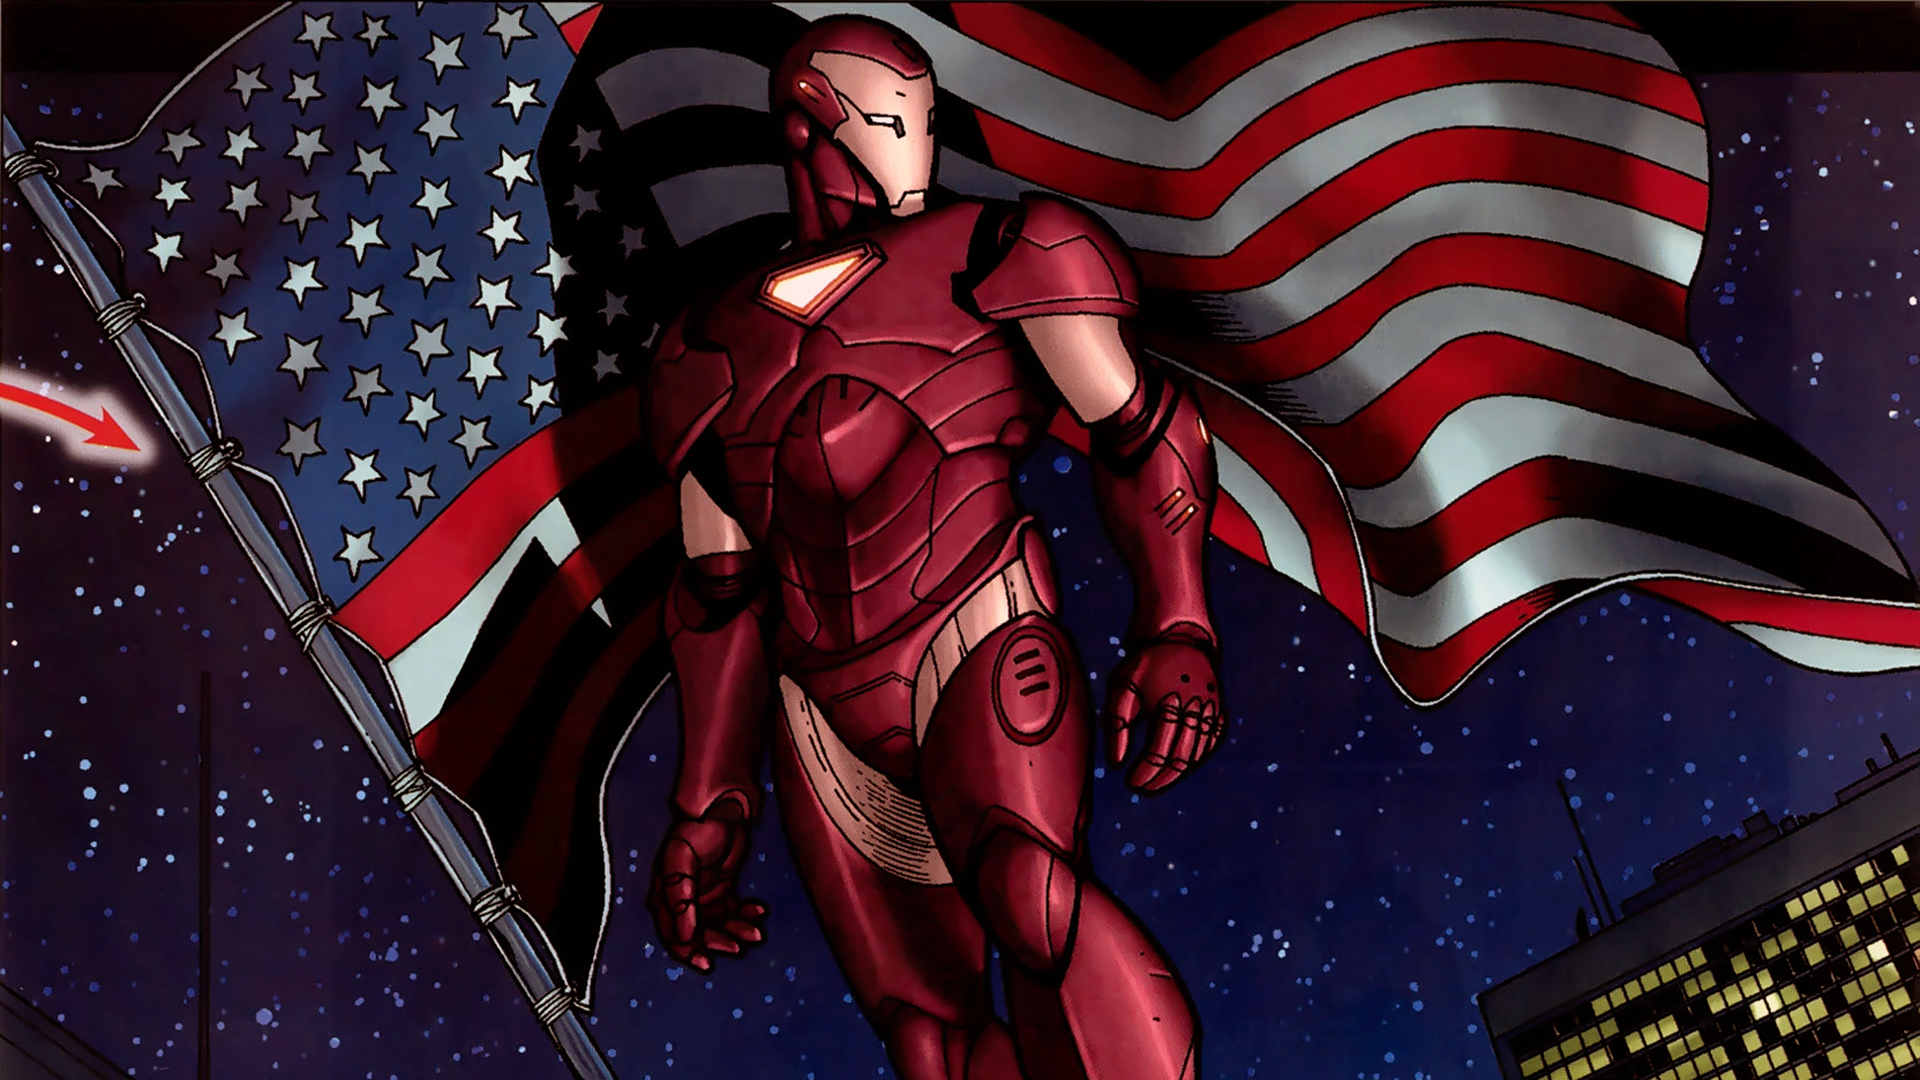 Iron Man Comic Wallpaper High Quality - Wickedsa com